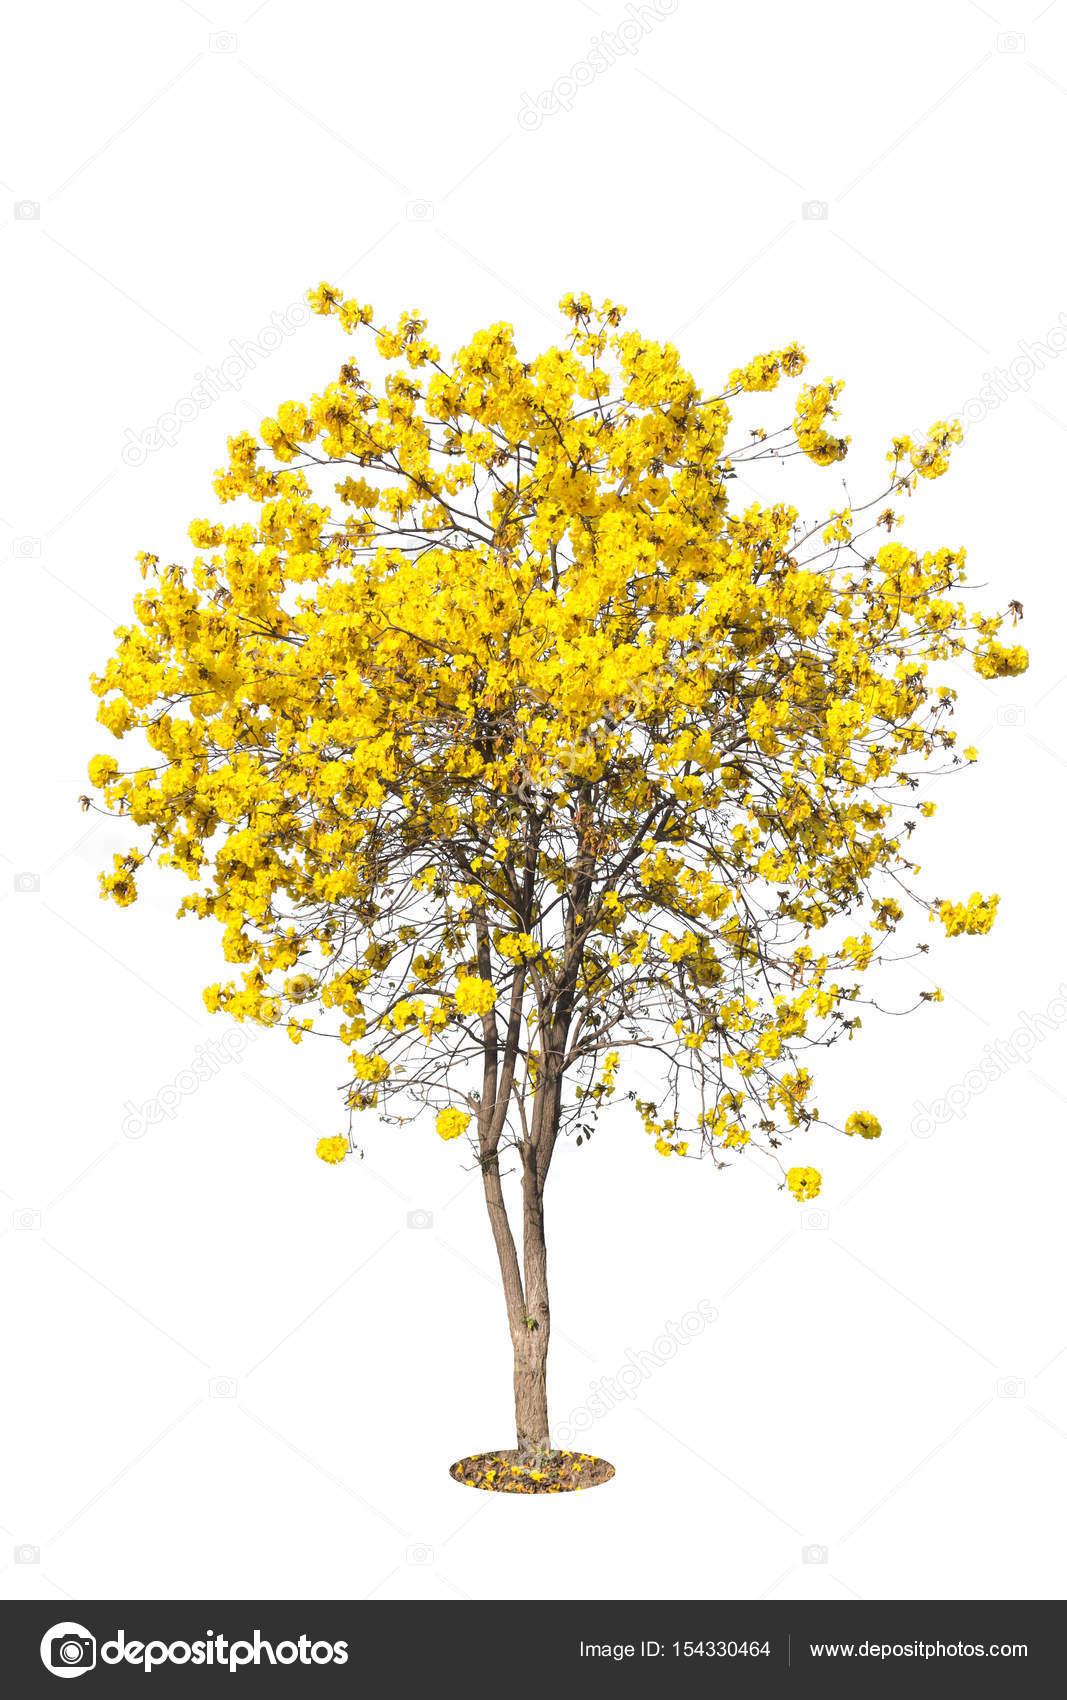 Golden tree yellow flowers tree tabebuia isolated stock photo golden tree yellow flowers tree tabebuia isolated stock photo mightylinksfo